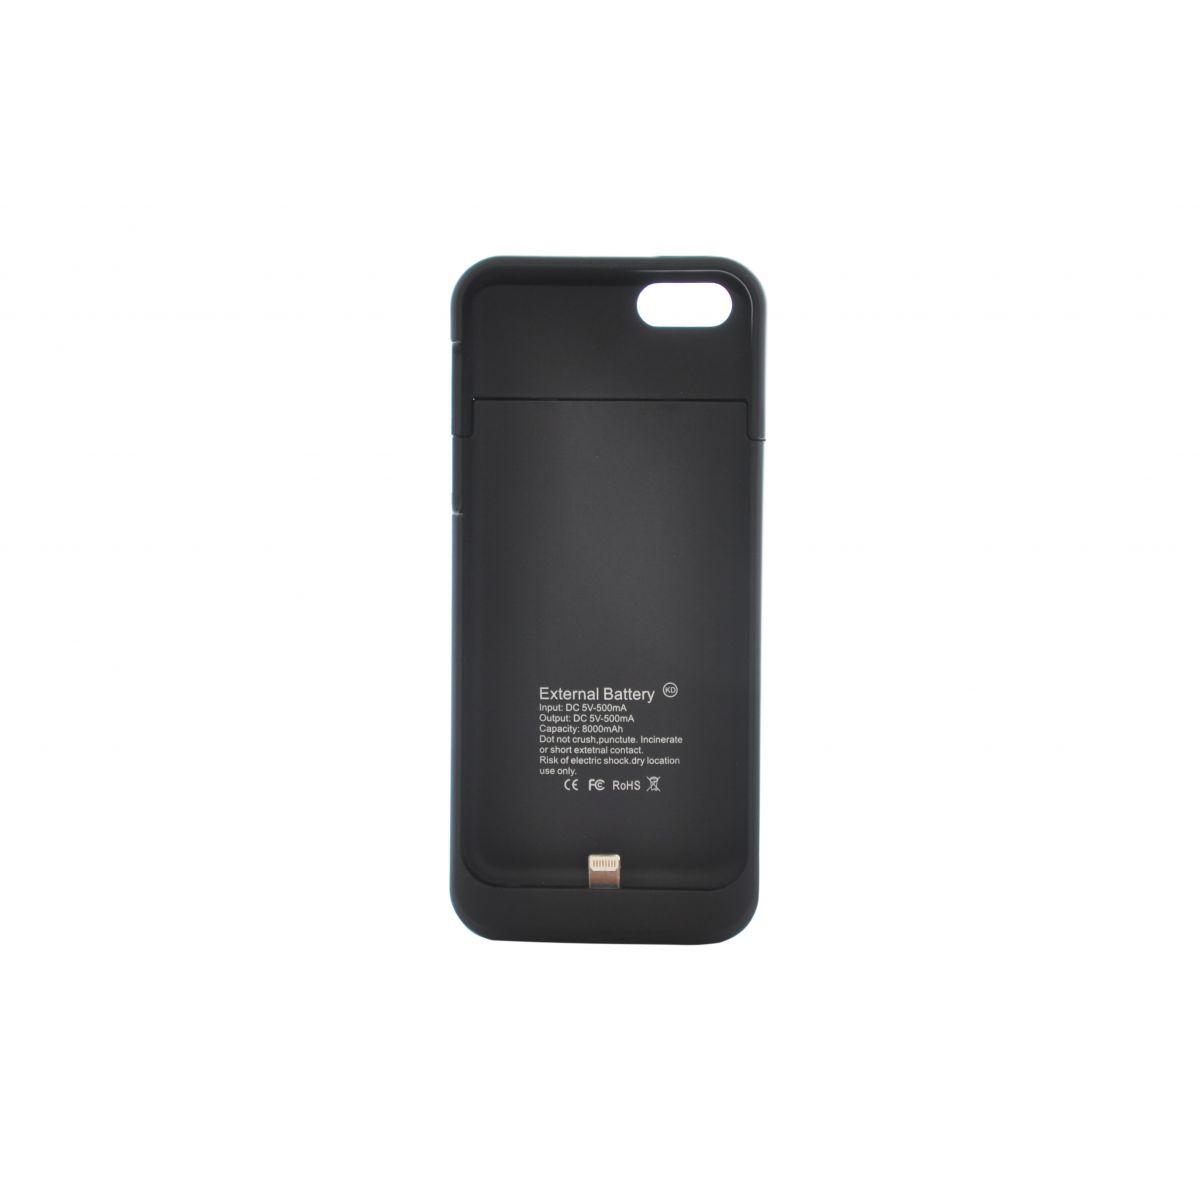 Capa Carregador Bateria Extra Apple Iphone 5 5s 2200 mAh